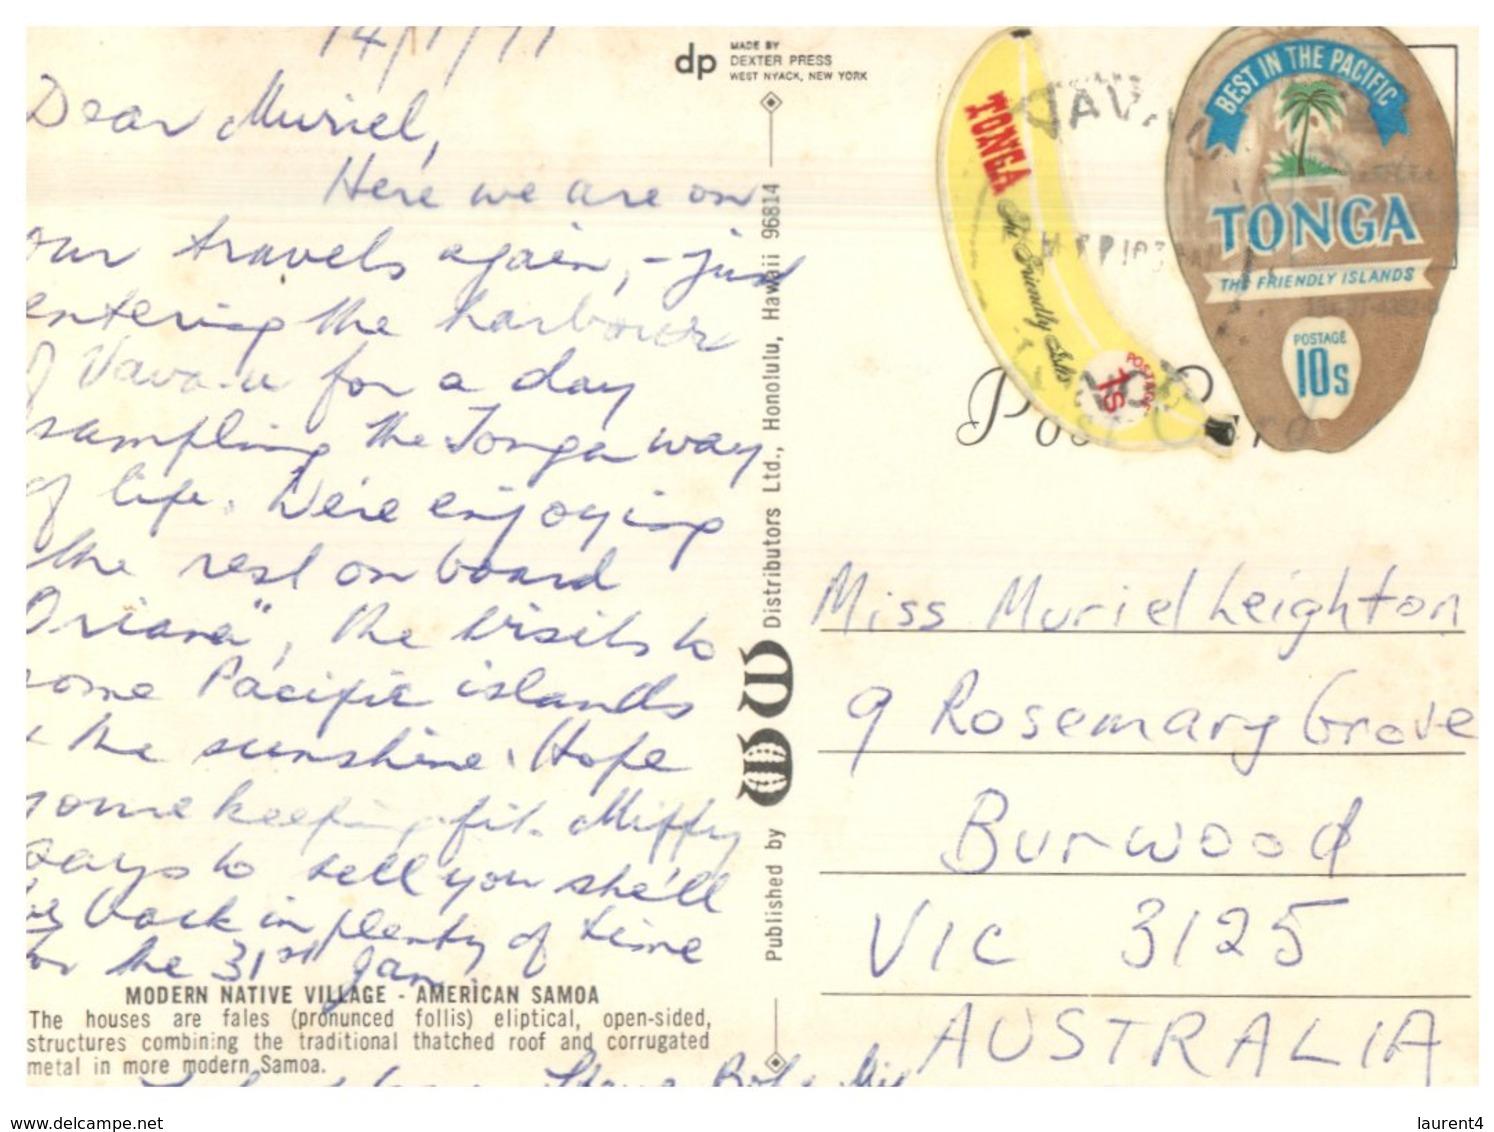 (215) American Samoa To Australia Postcard - Modern Native Village (but Posted With Tonga Stamps) - Samoa Americana